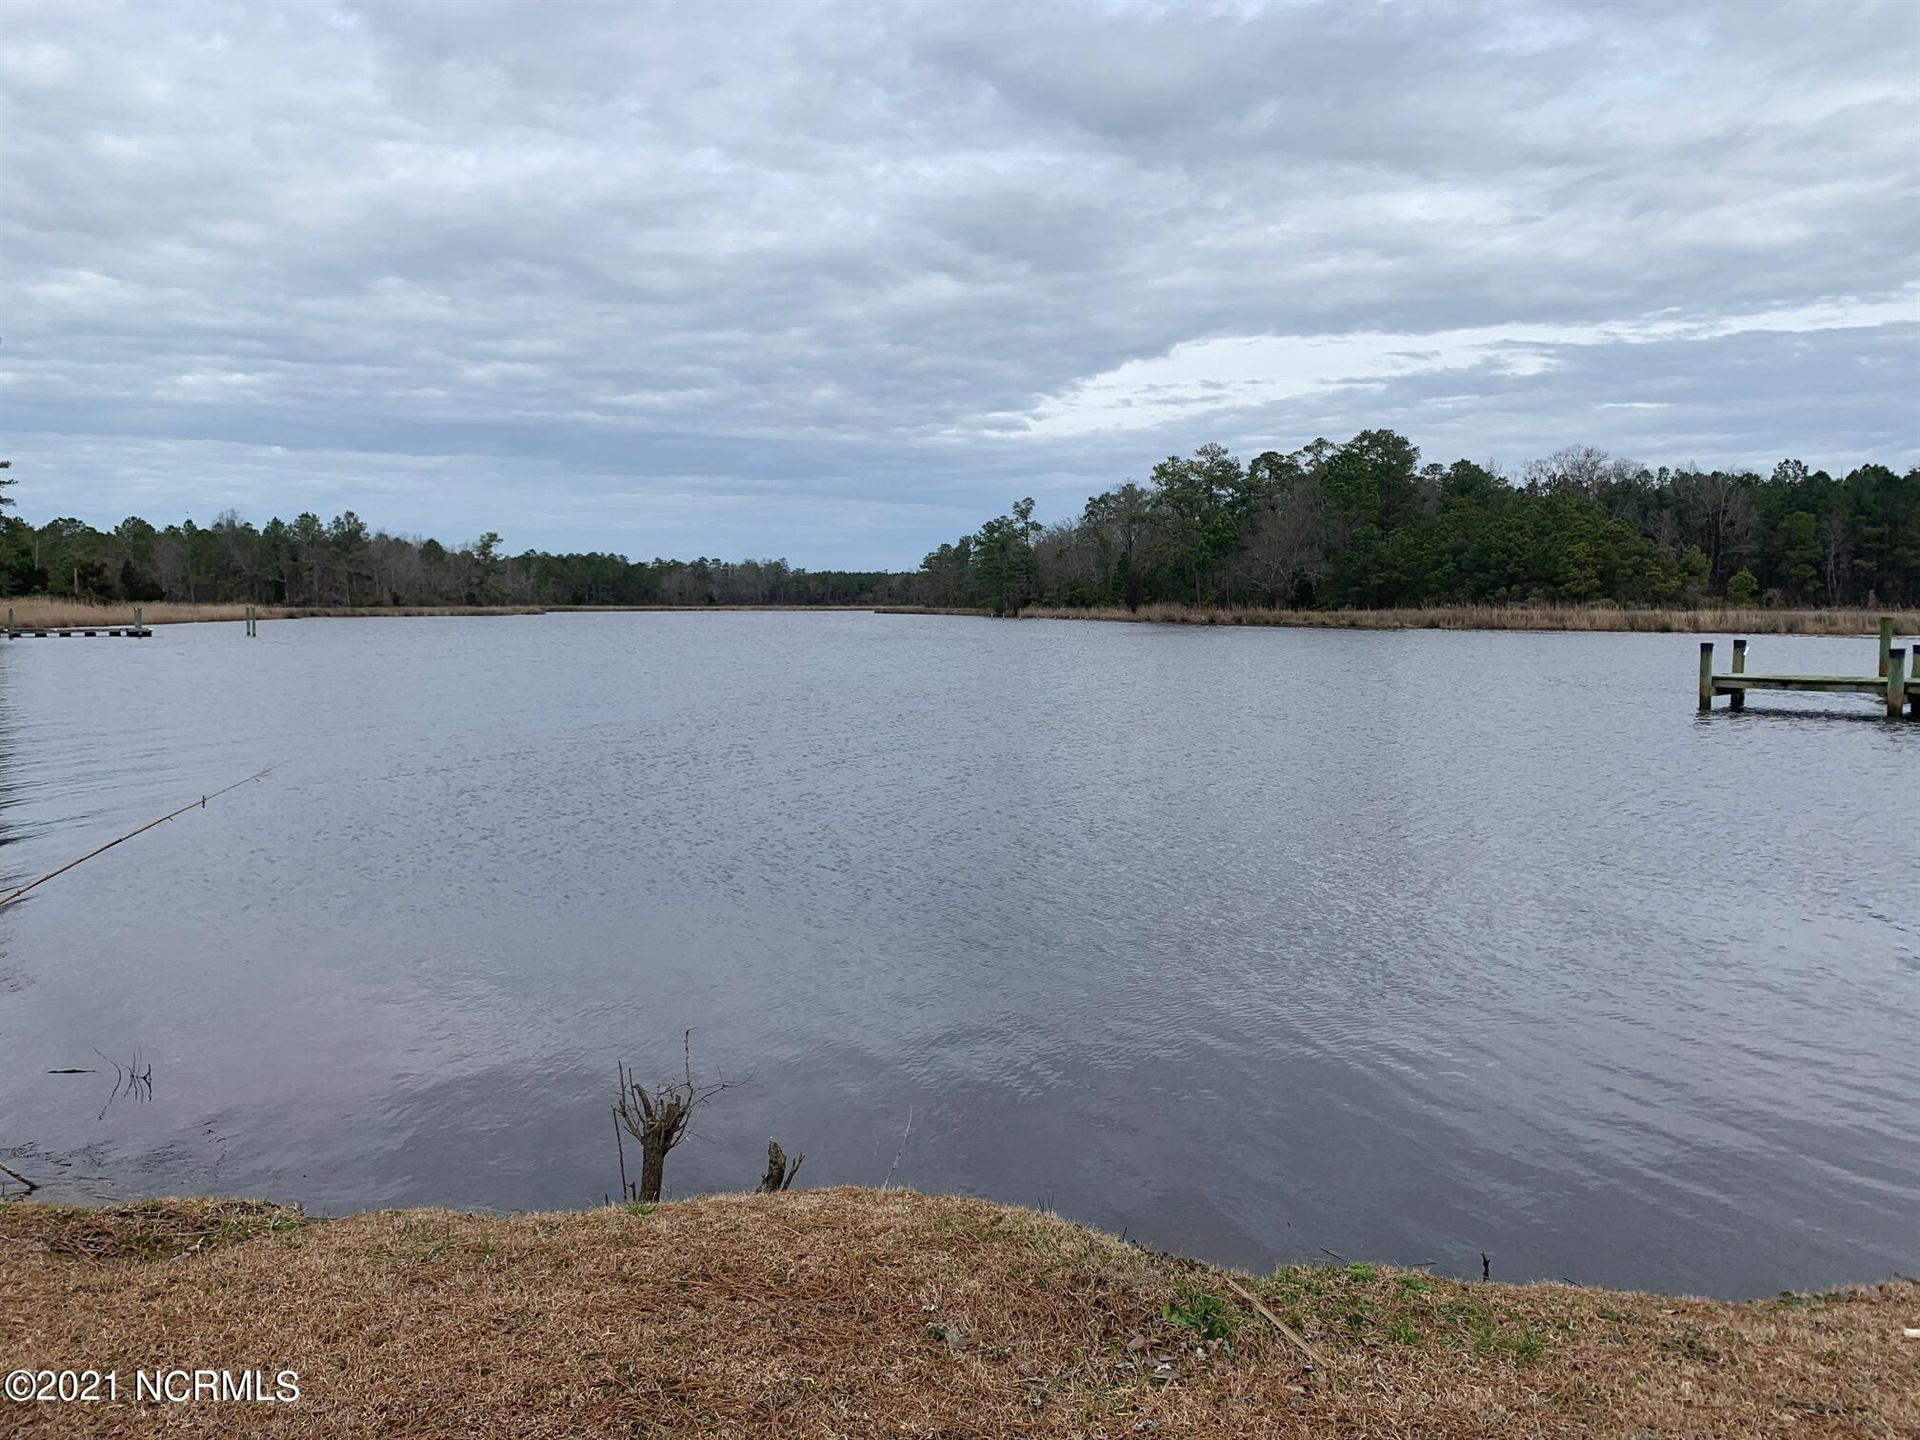 Photo of Lot 34 N Creek Drive, Belhaven, NC 27810 (MLS # 100258736)